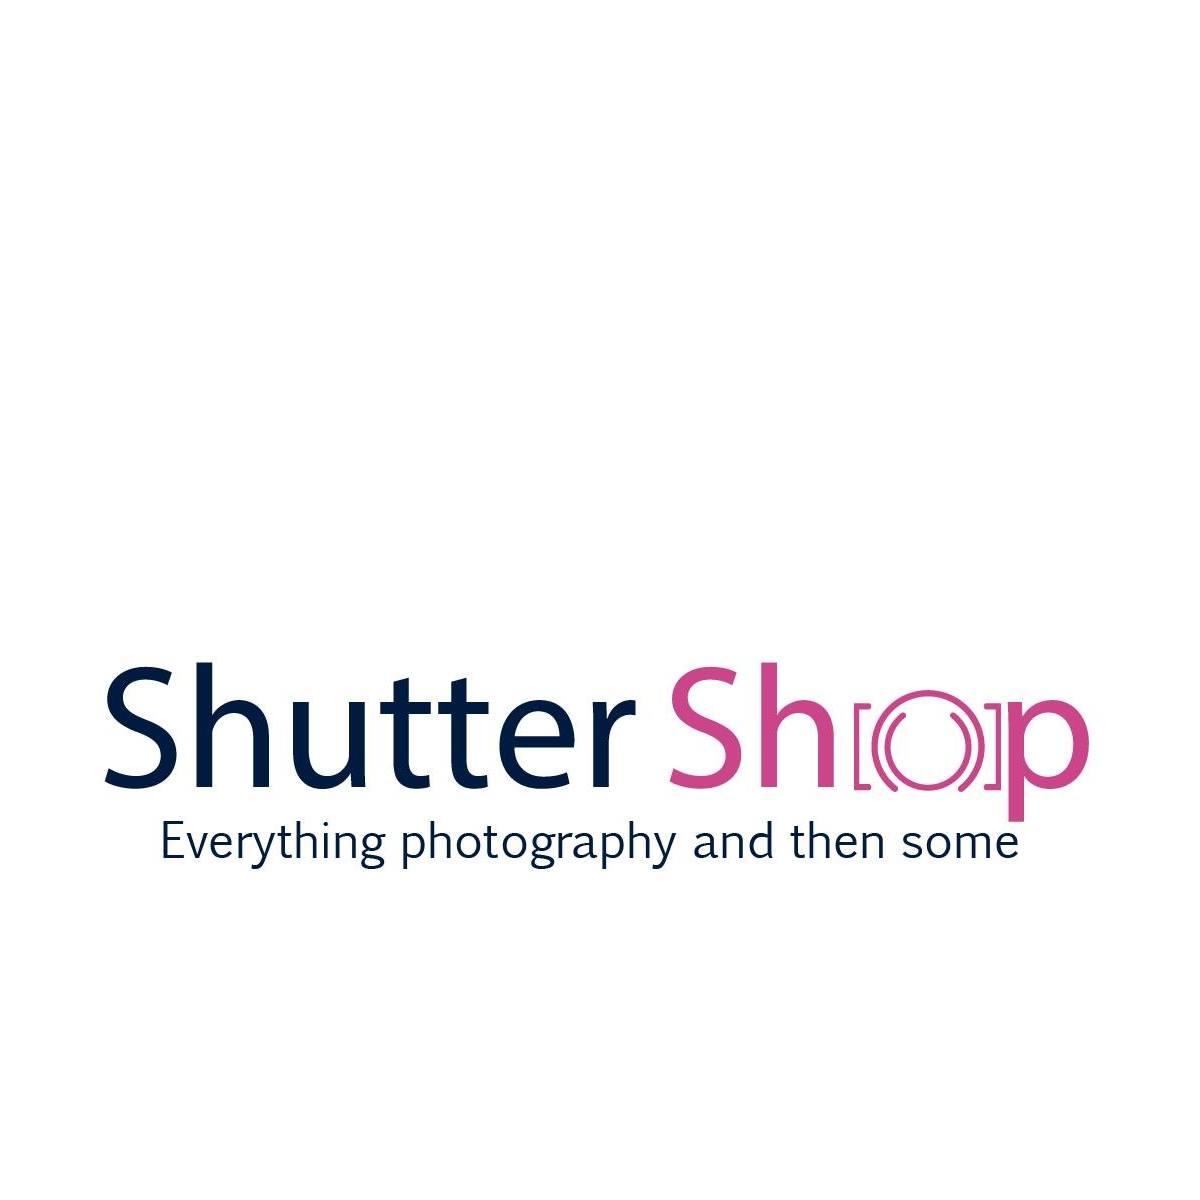 شتر شوب Shutter Shop